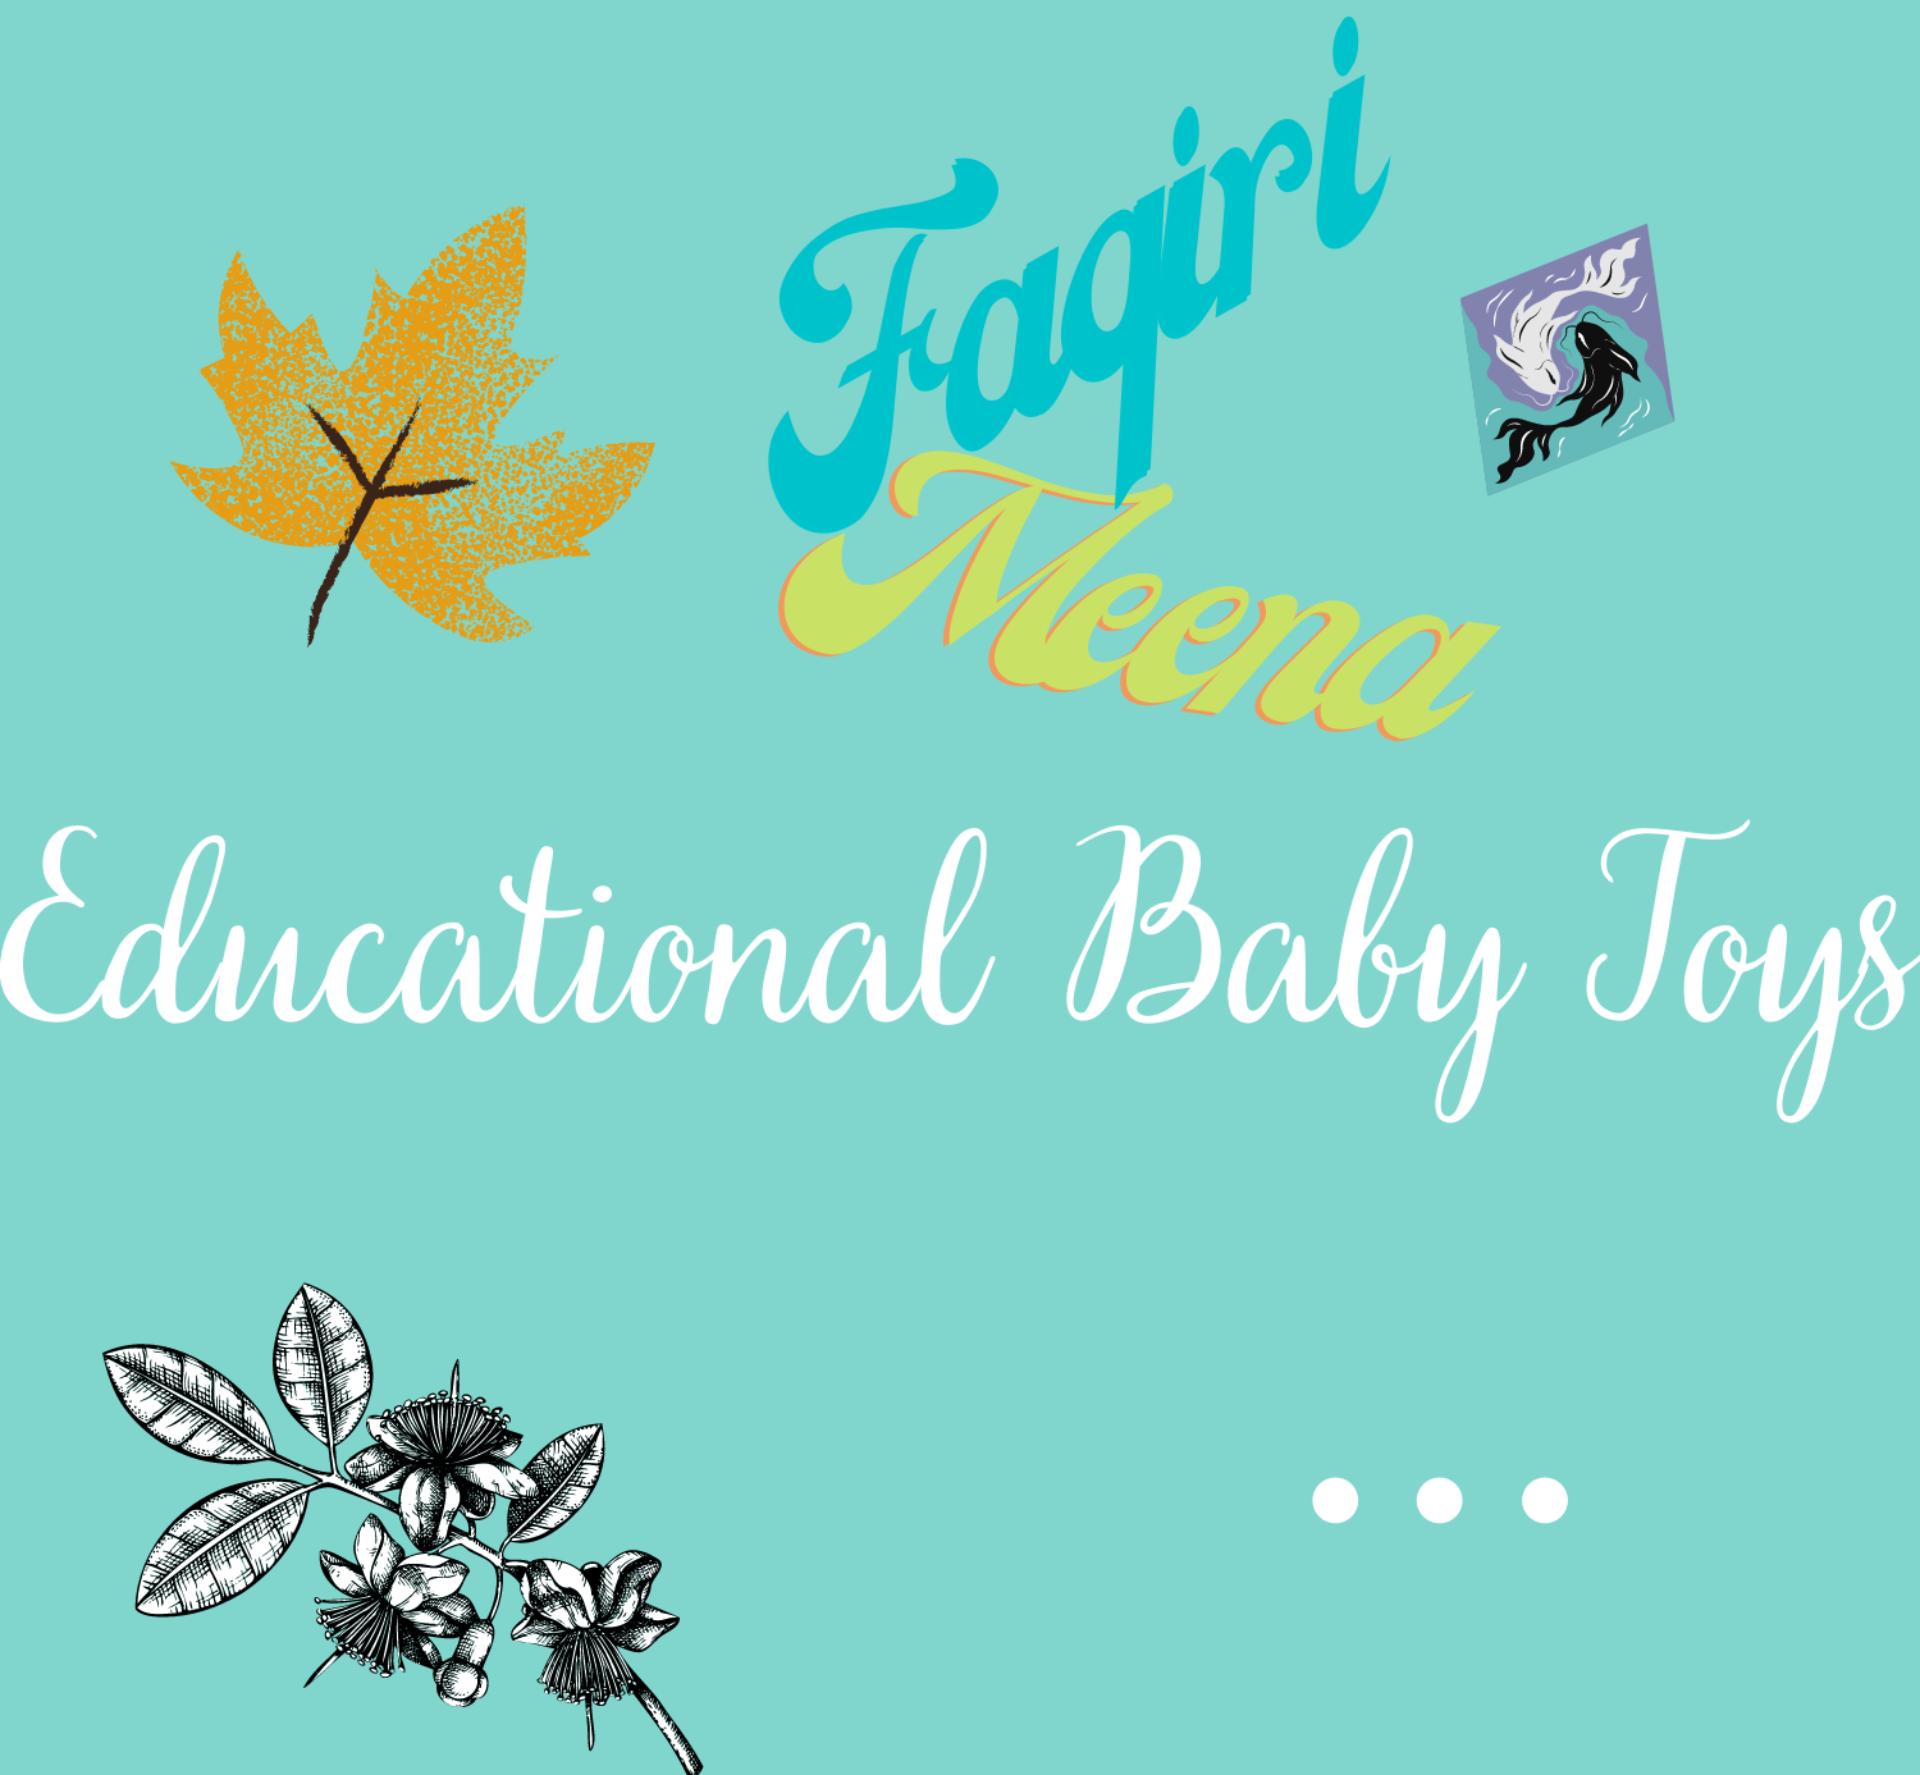 Educational Baby Toys 1st Logo